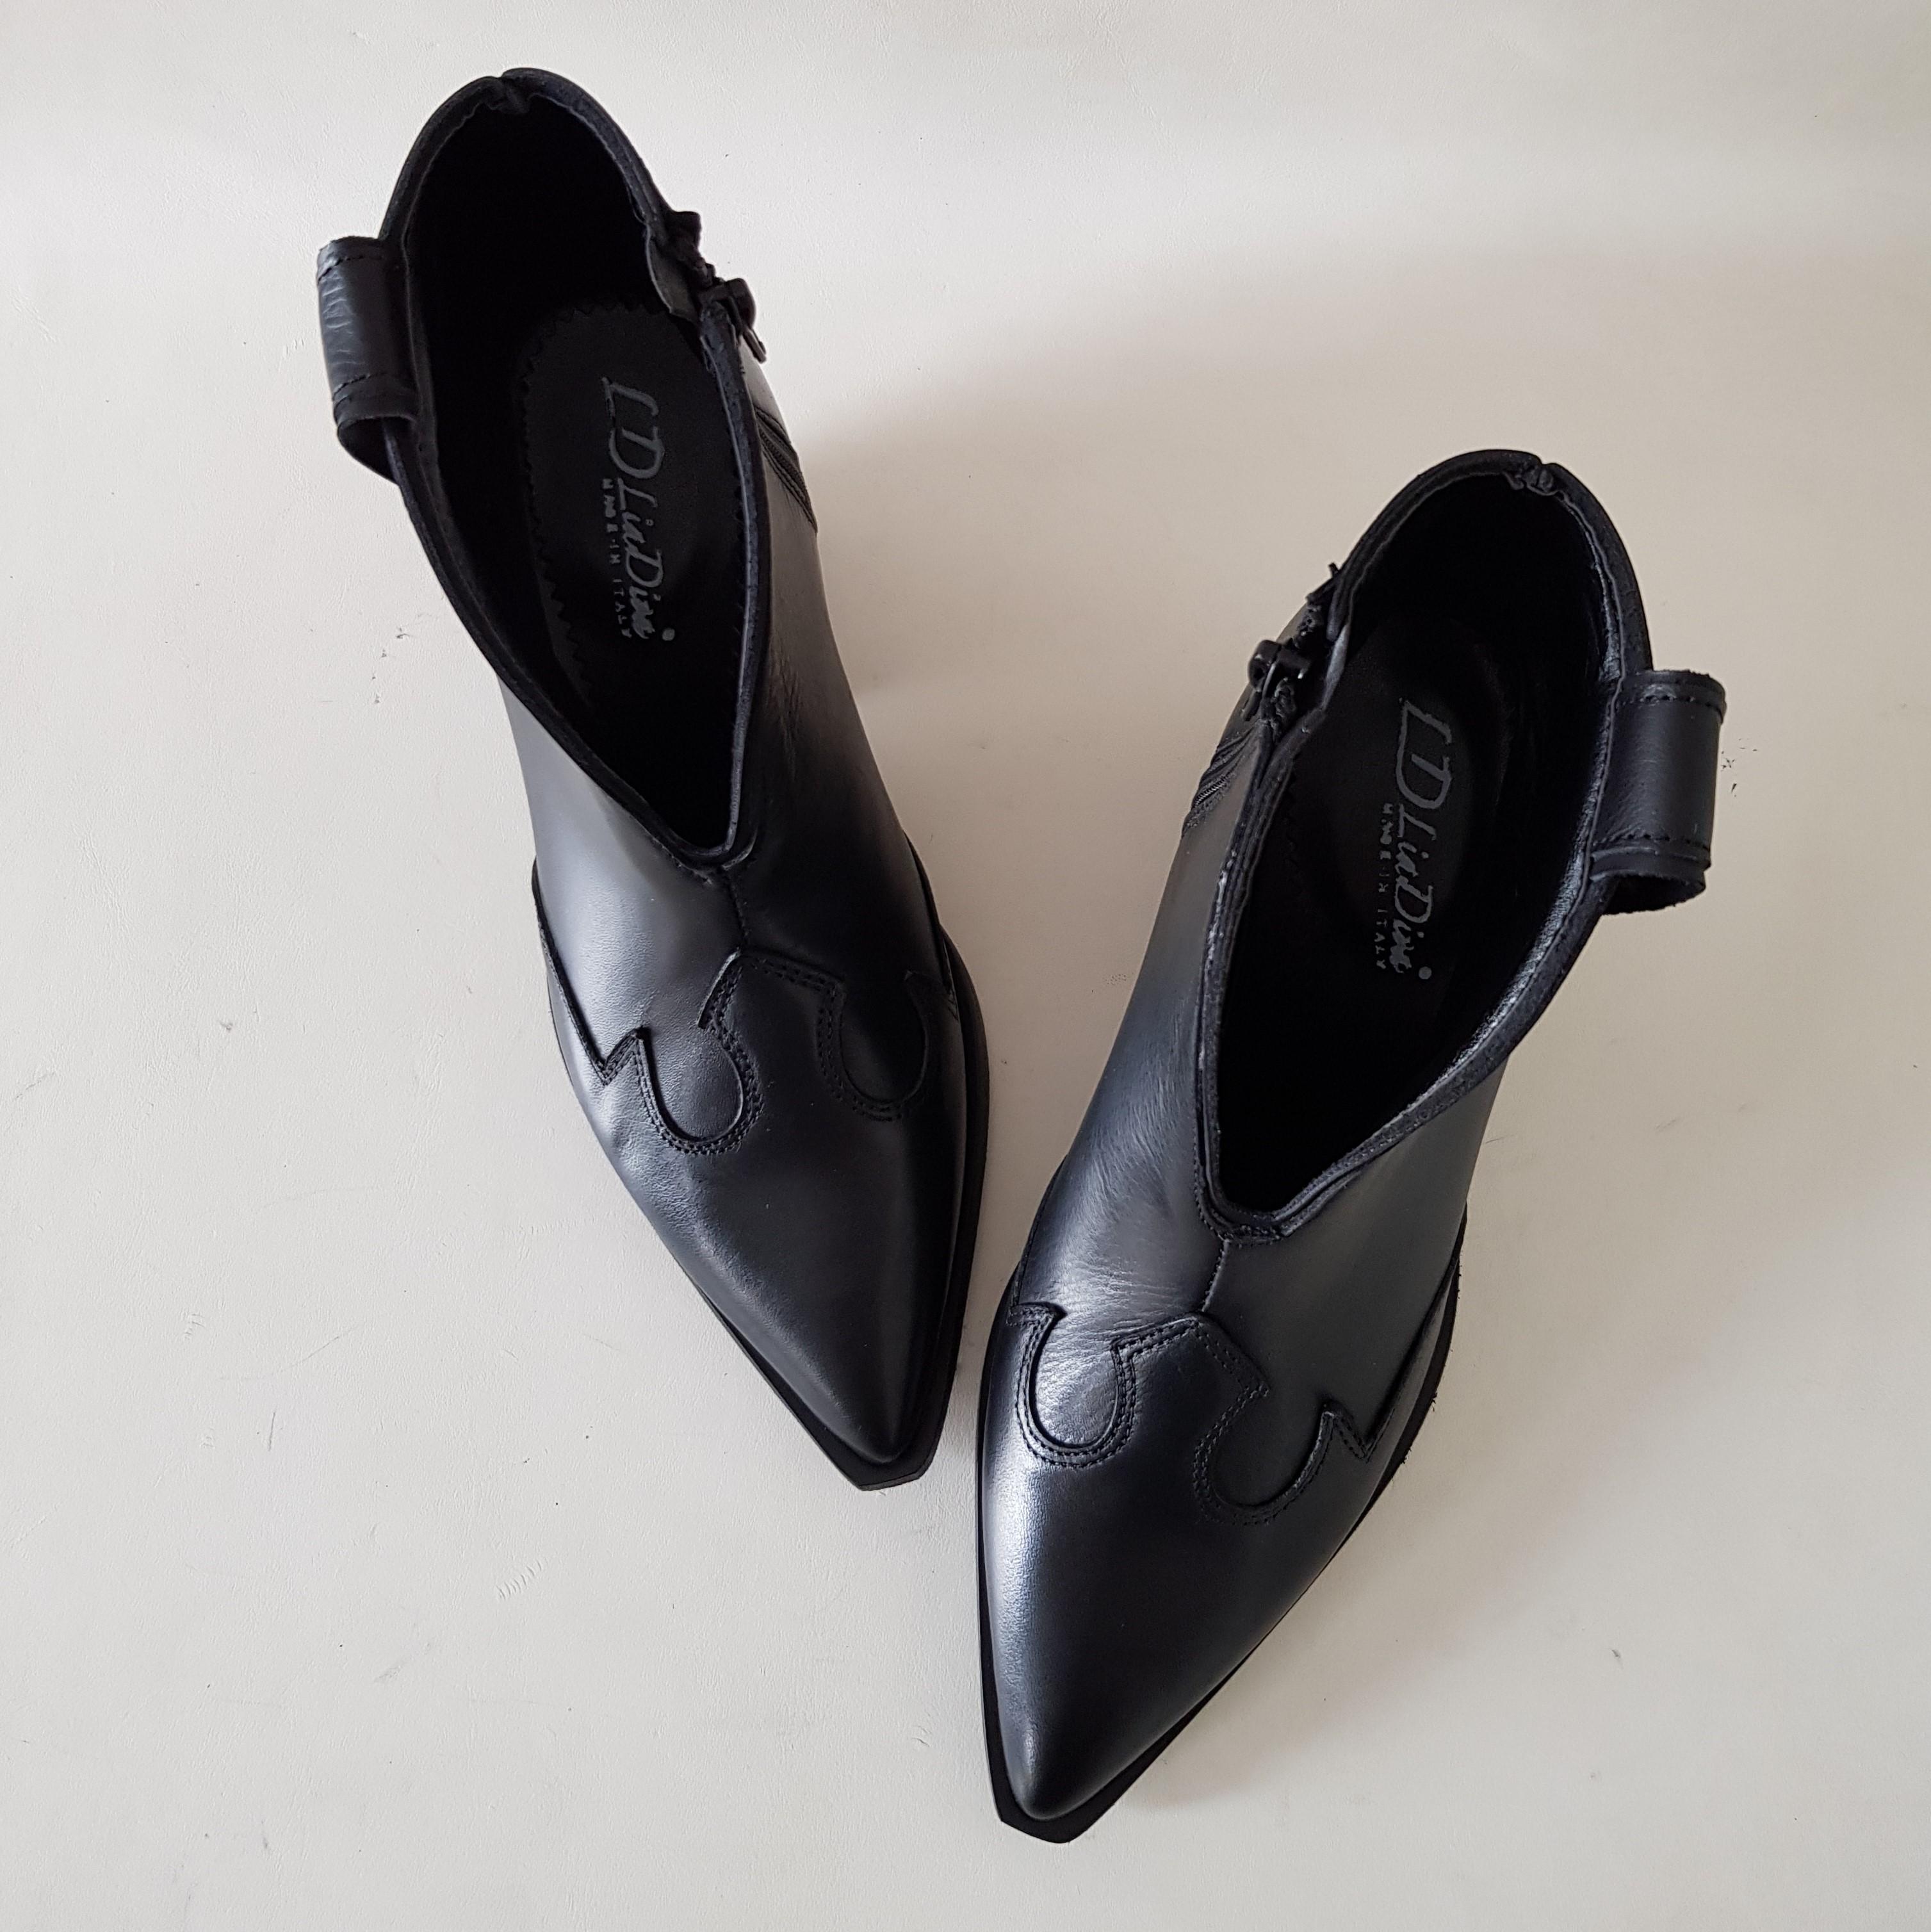 Stivaletti pelle nero stephan 10 - Lia diva scarpe ...